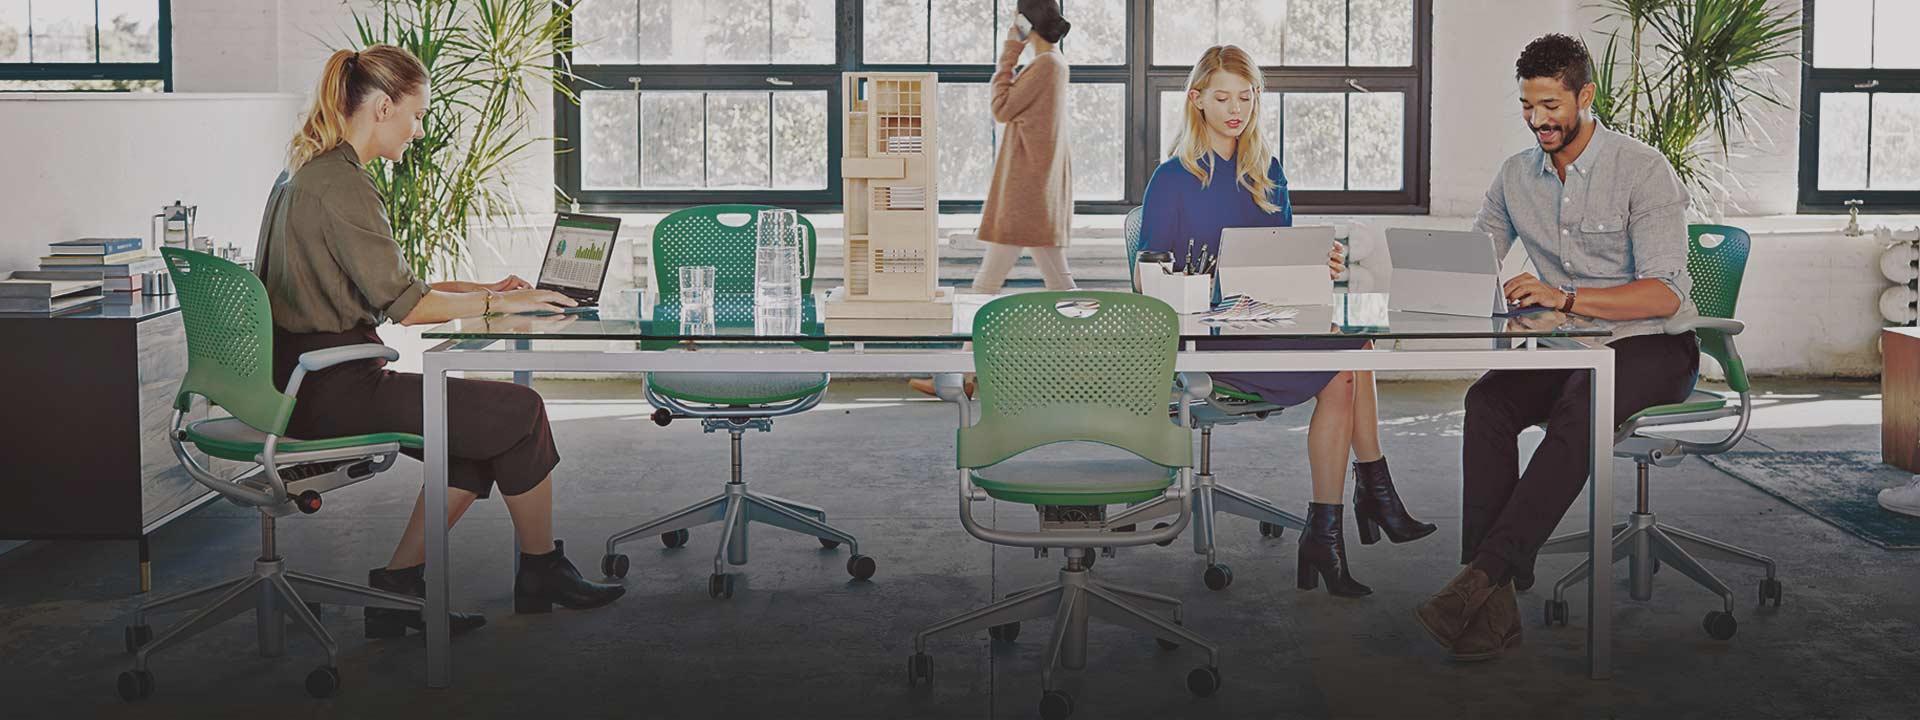 Orang sedang bekerja, selengkapnya tentang Office 365